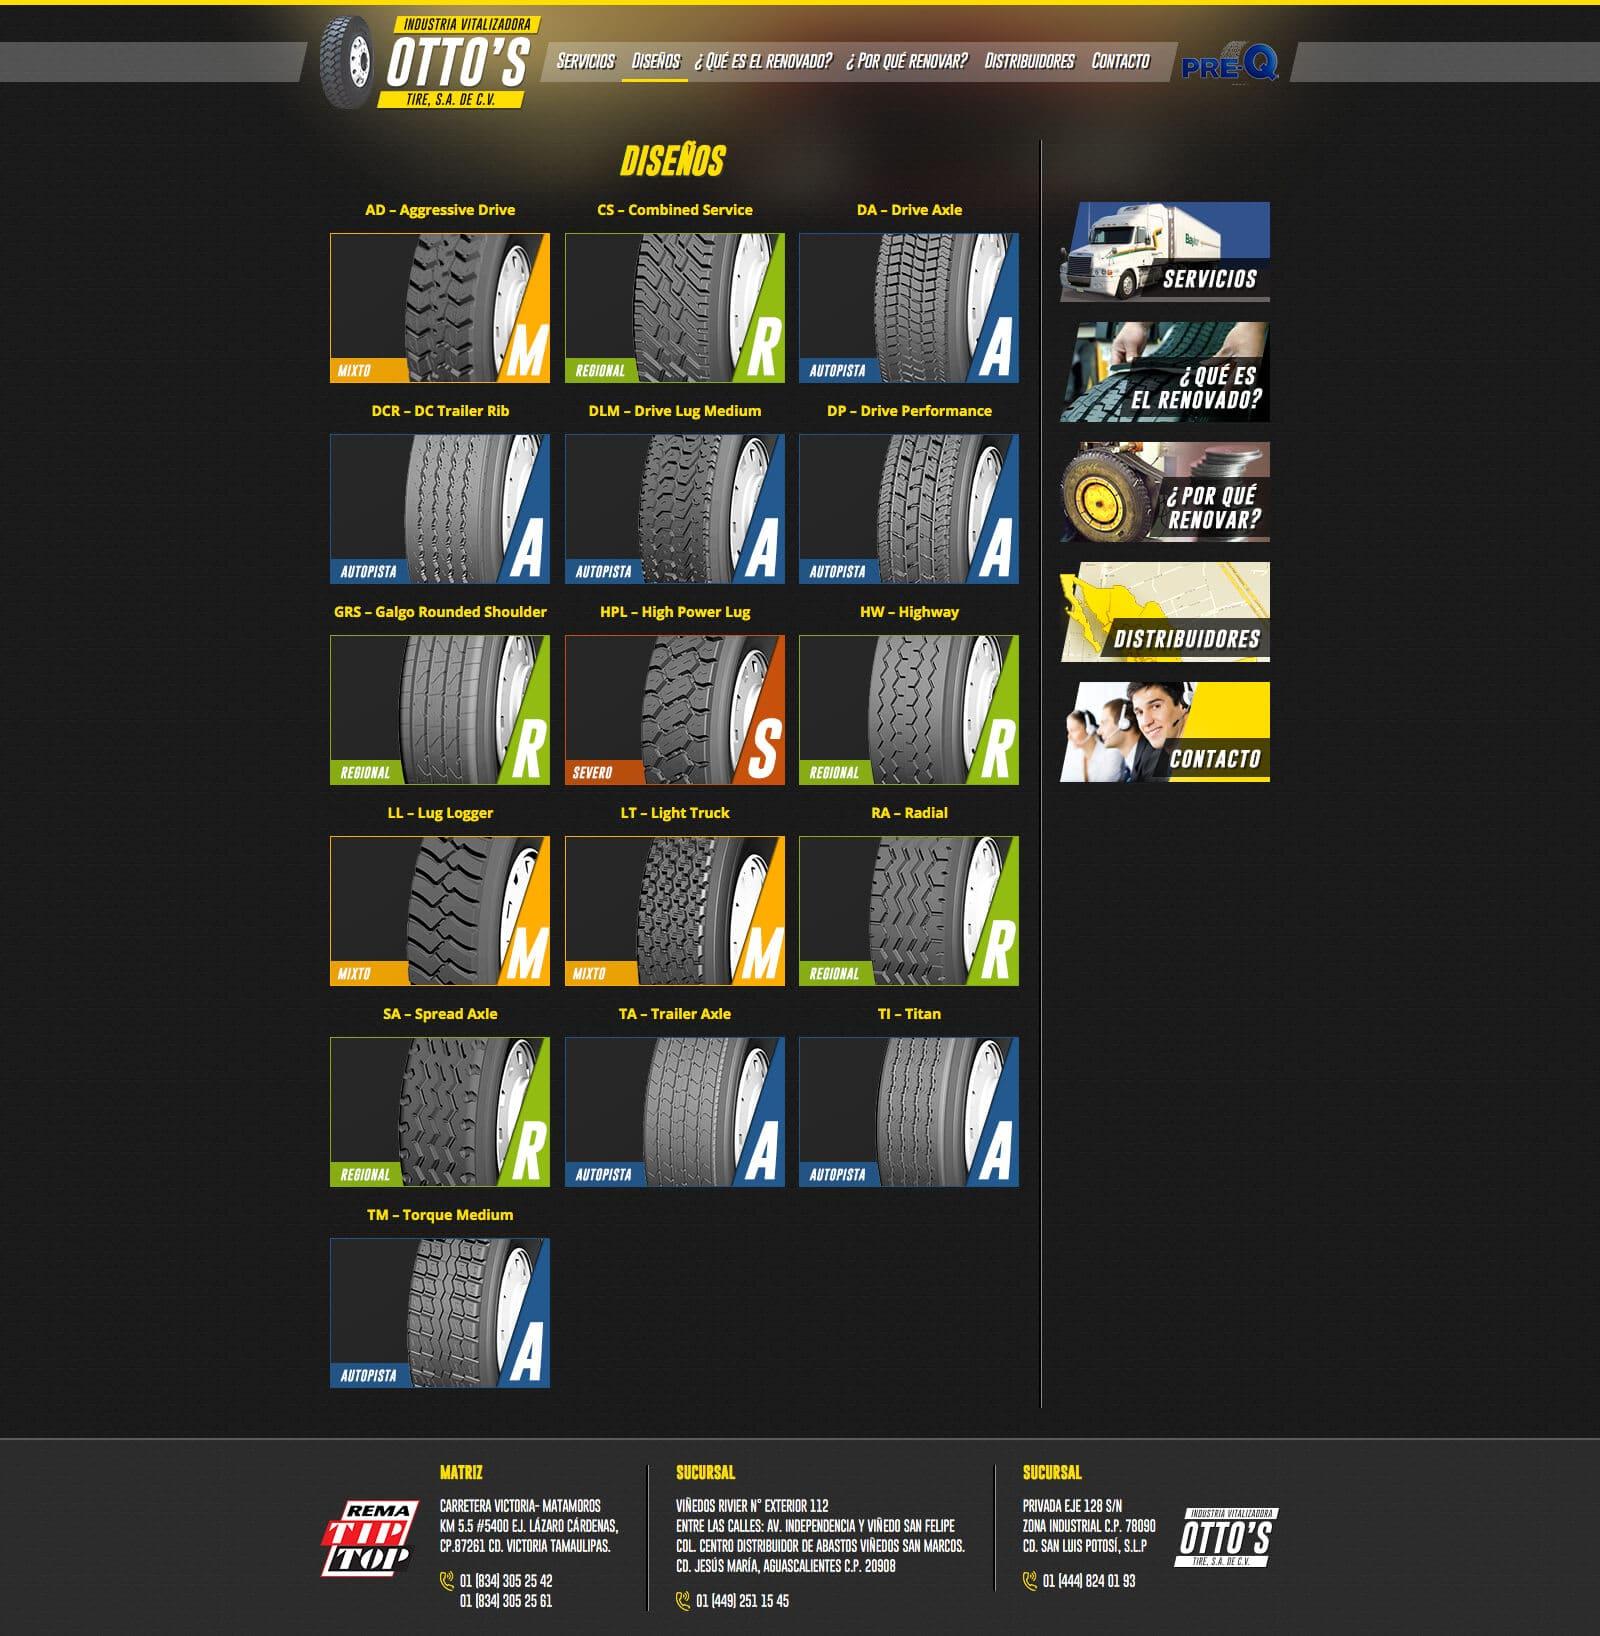 screencapture-ottostire-disenos-2021-03-16-12_46_44